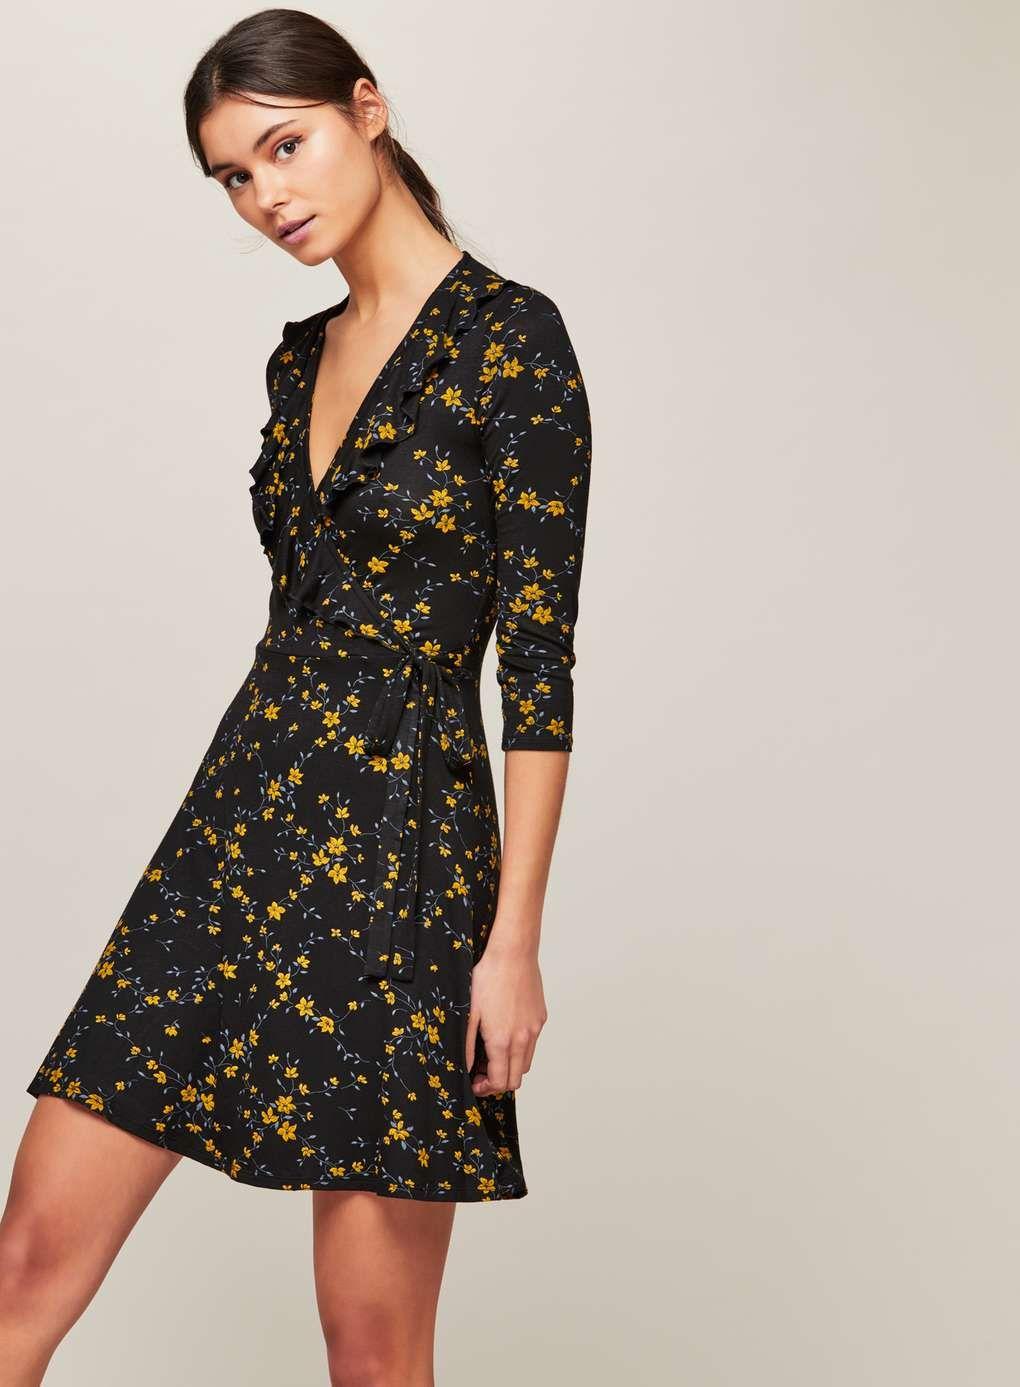 Womens Stripe High Neck Swing Dress Miss Selfridge Free Shipping Best Wholesale 08epGn